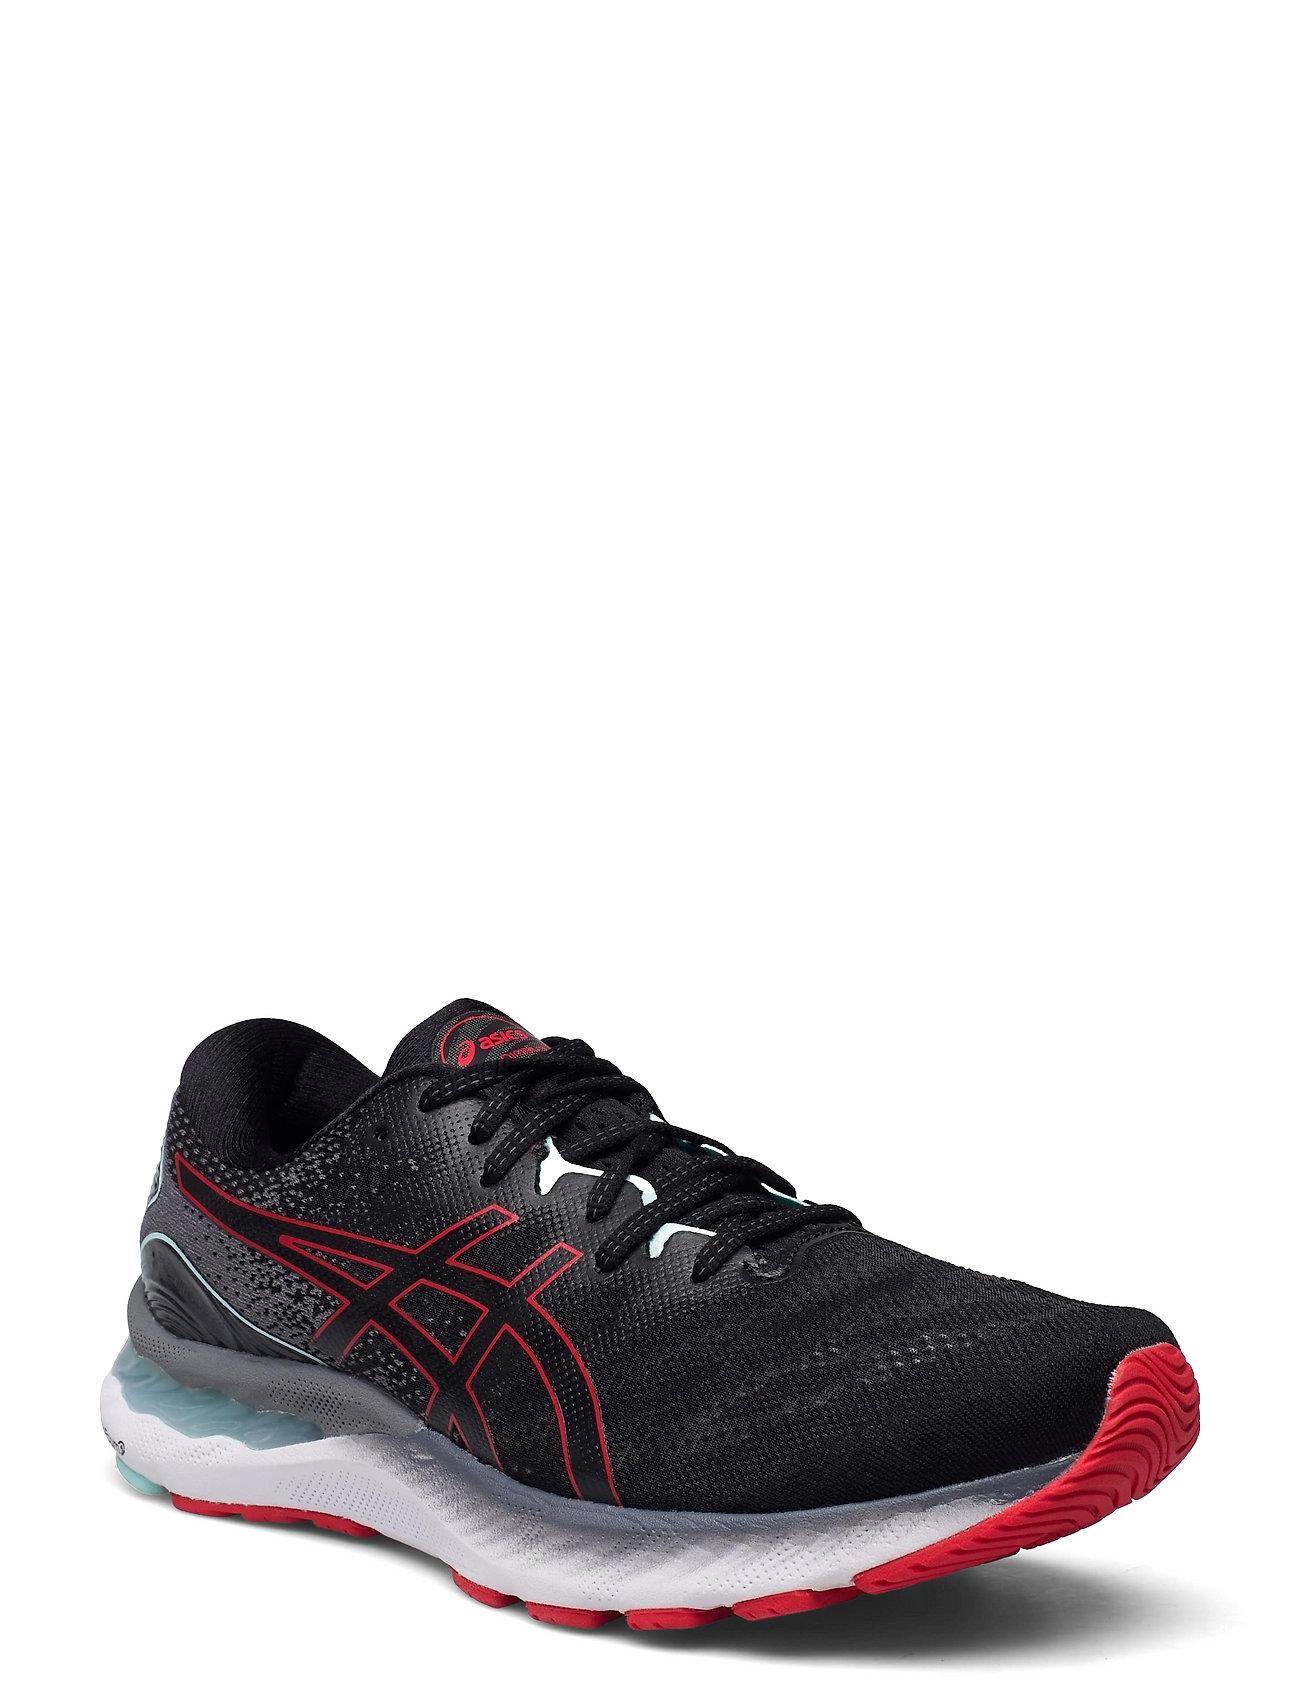 Gel-Nimbus 23 Shoes Sport Shoes Running Shoes Sort Asics